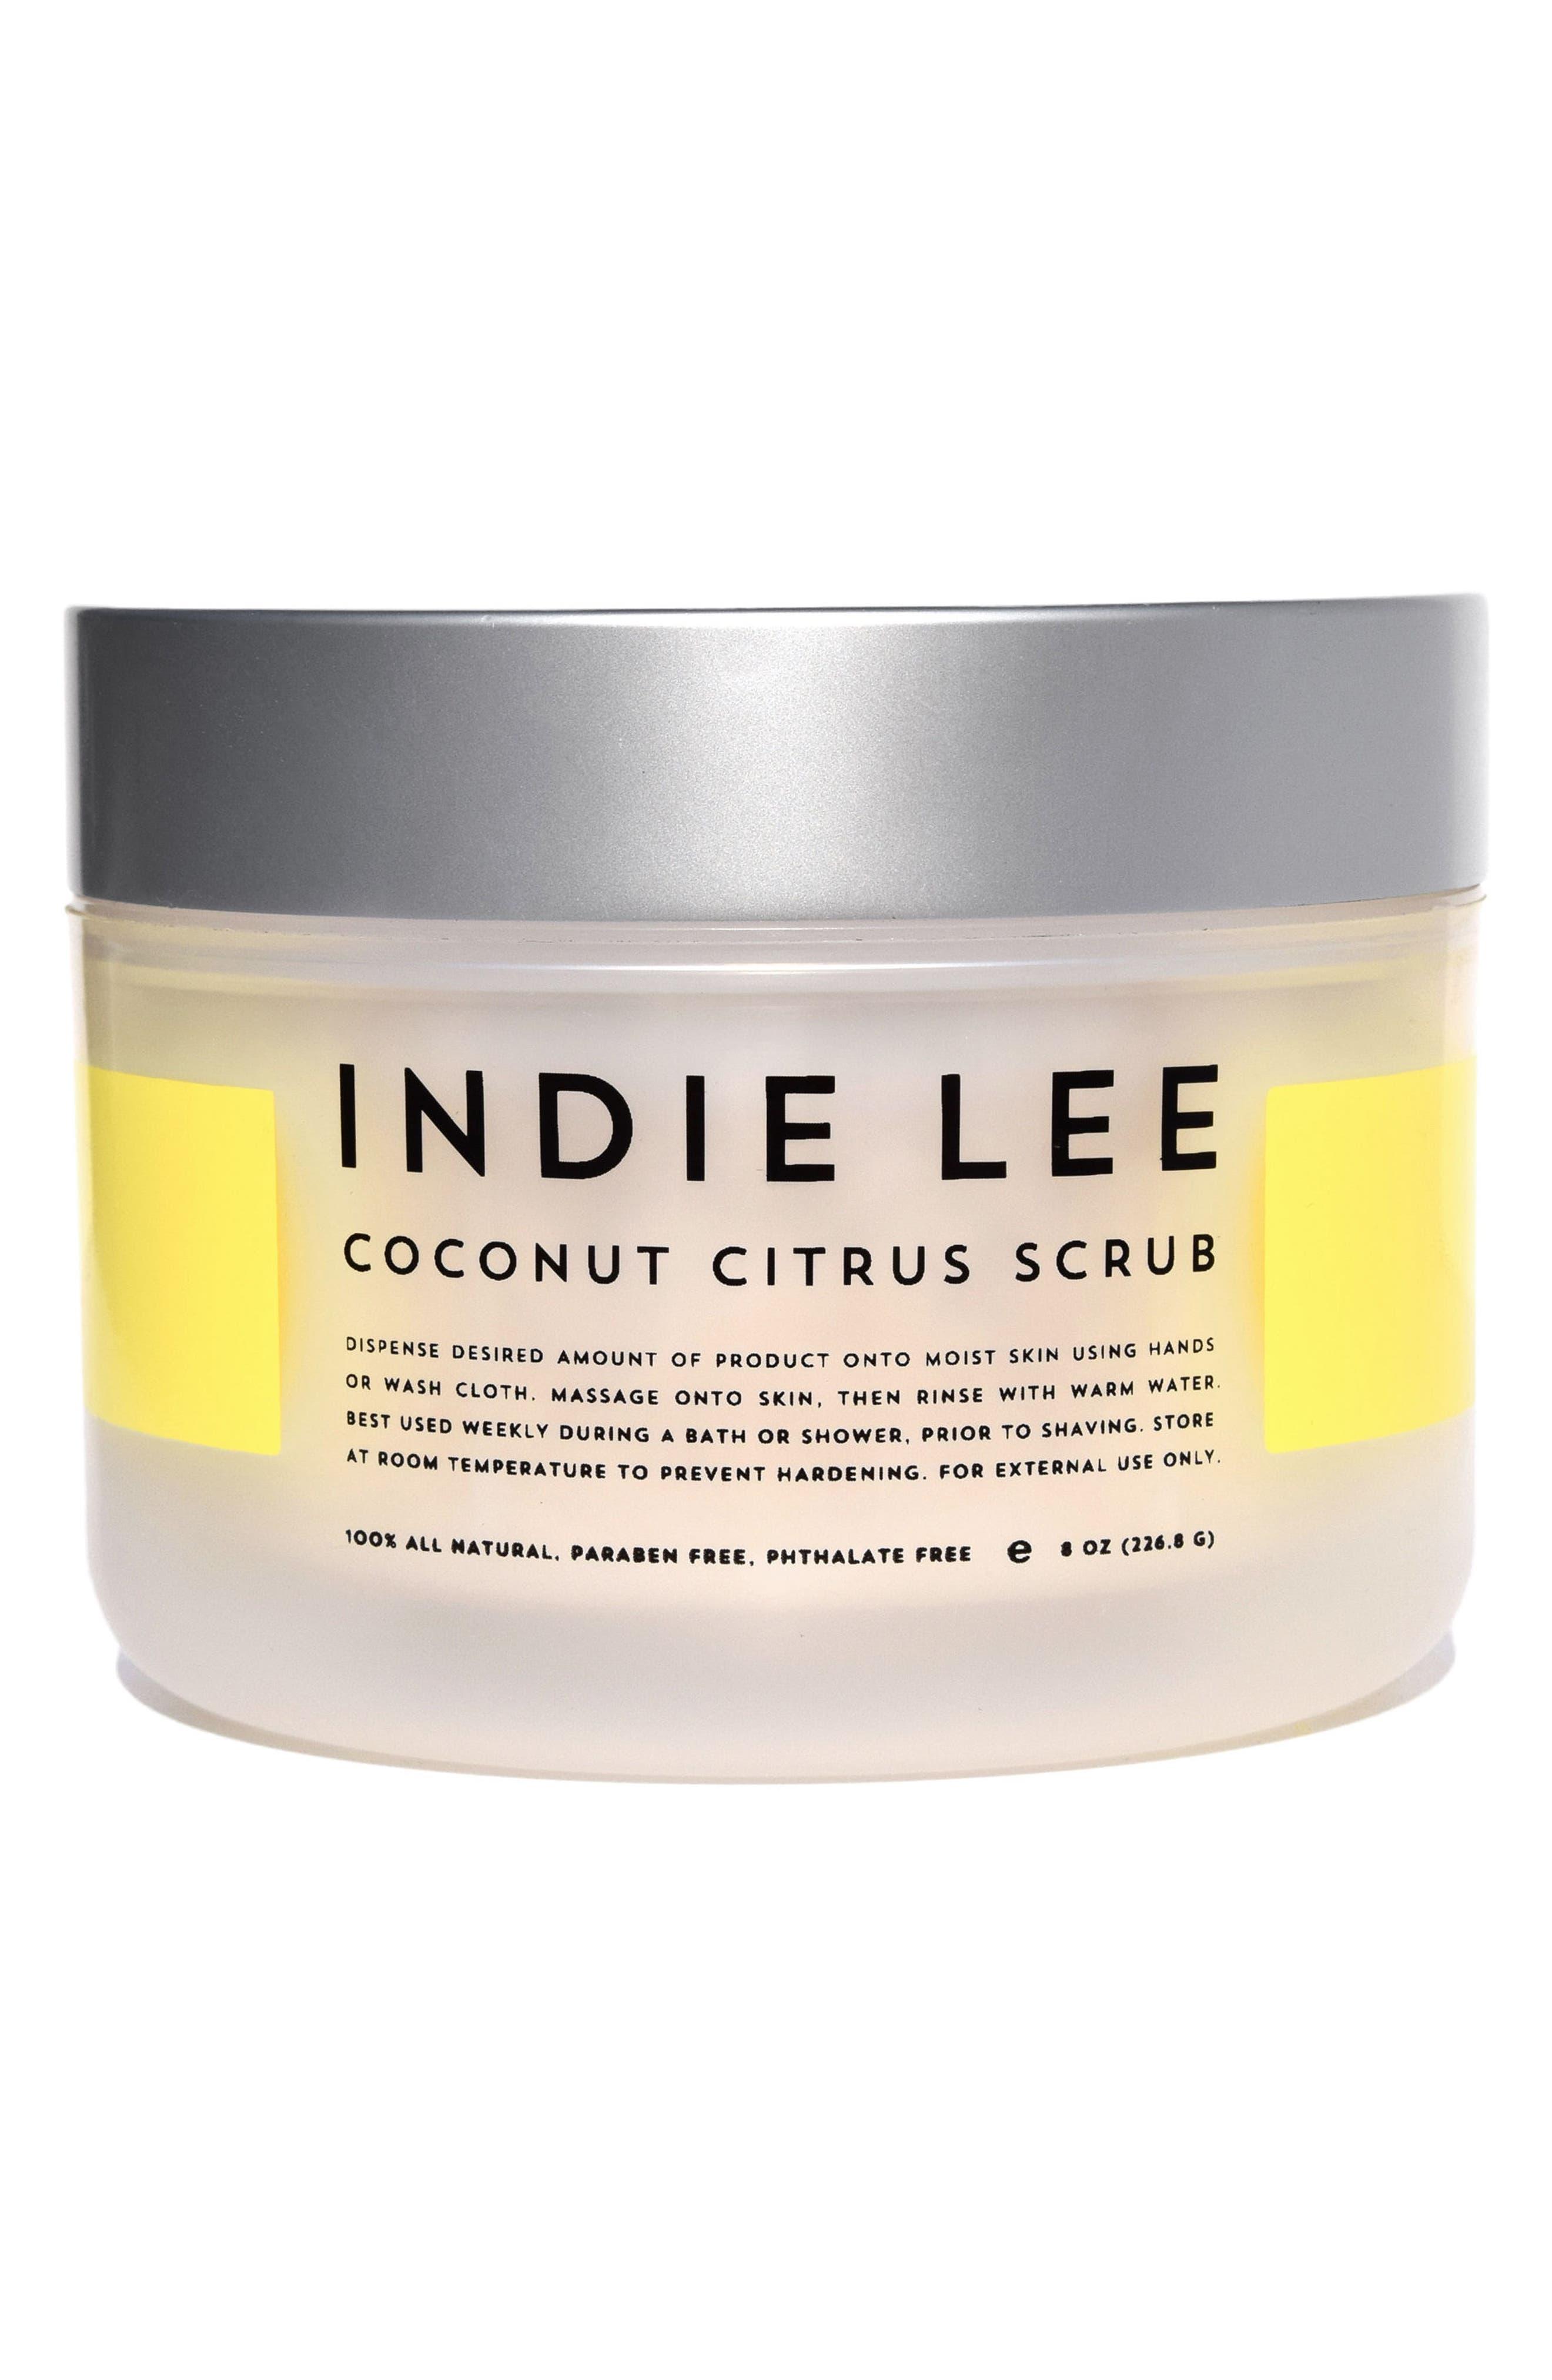 Alternate Image 1 Selected - Indie Lee Coconut Citrus Body Scrub